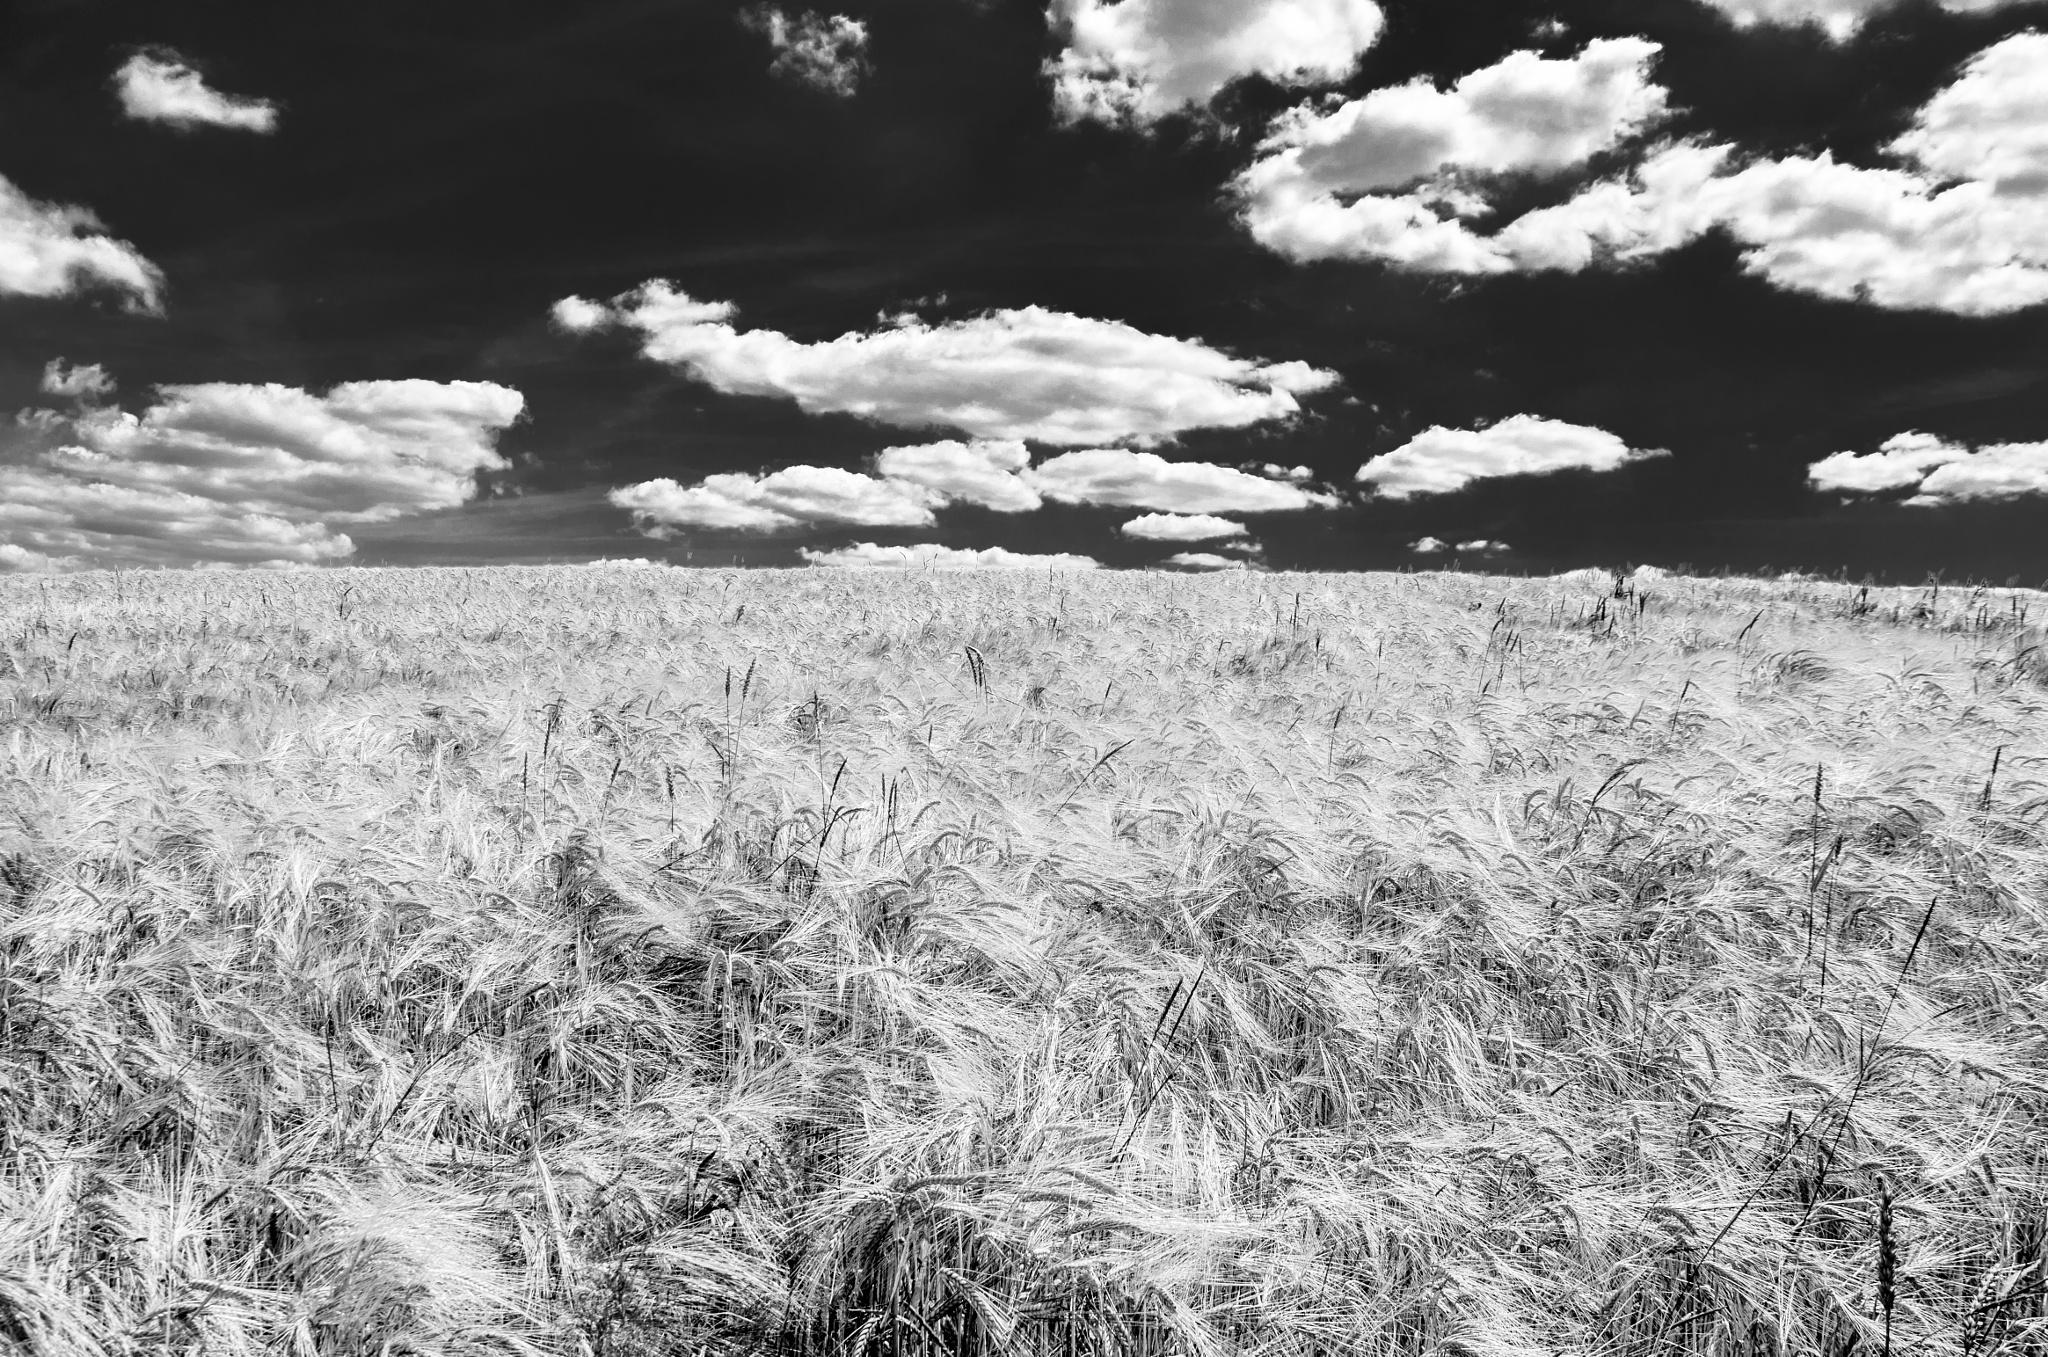 Grain field by Marianne Drews